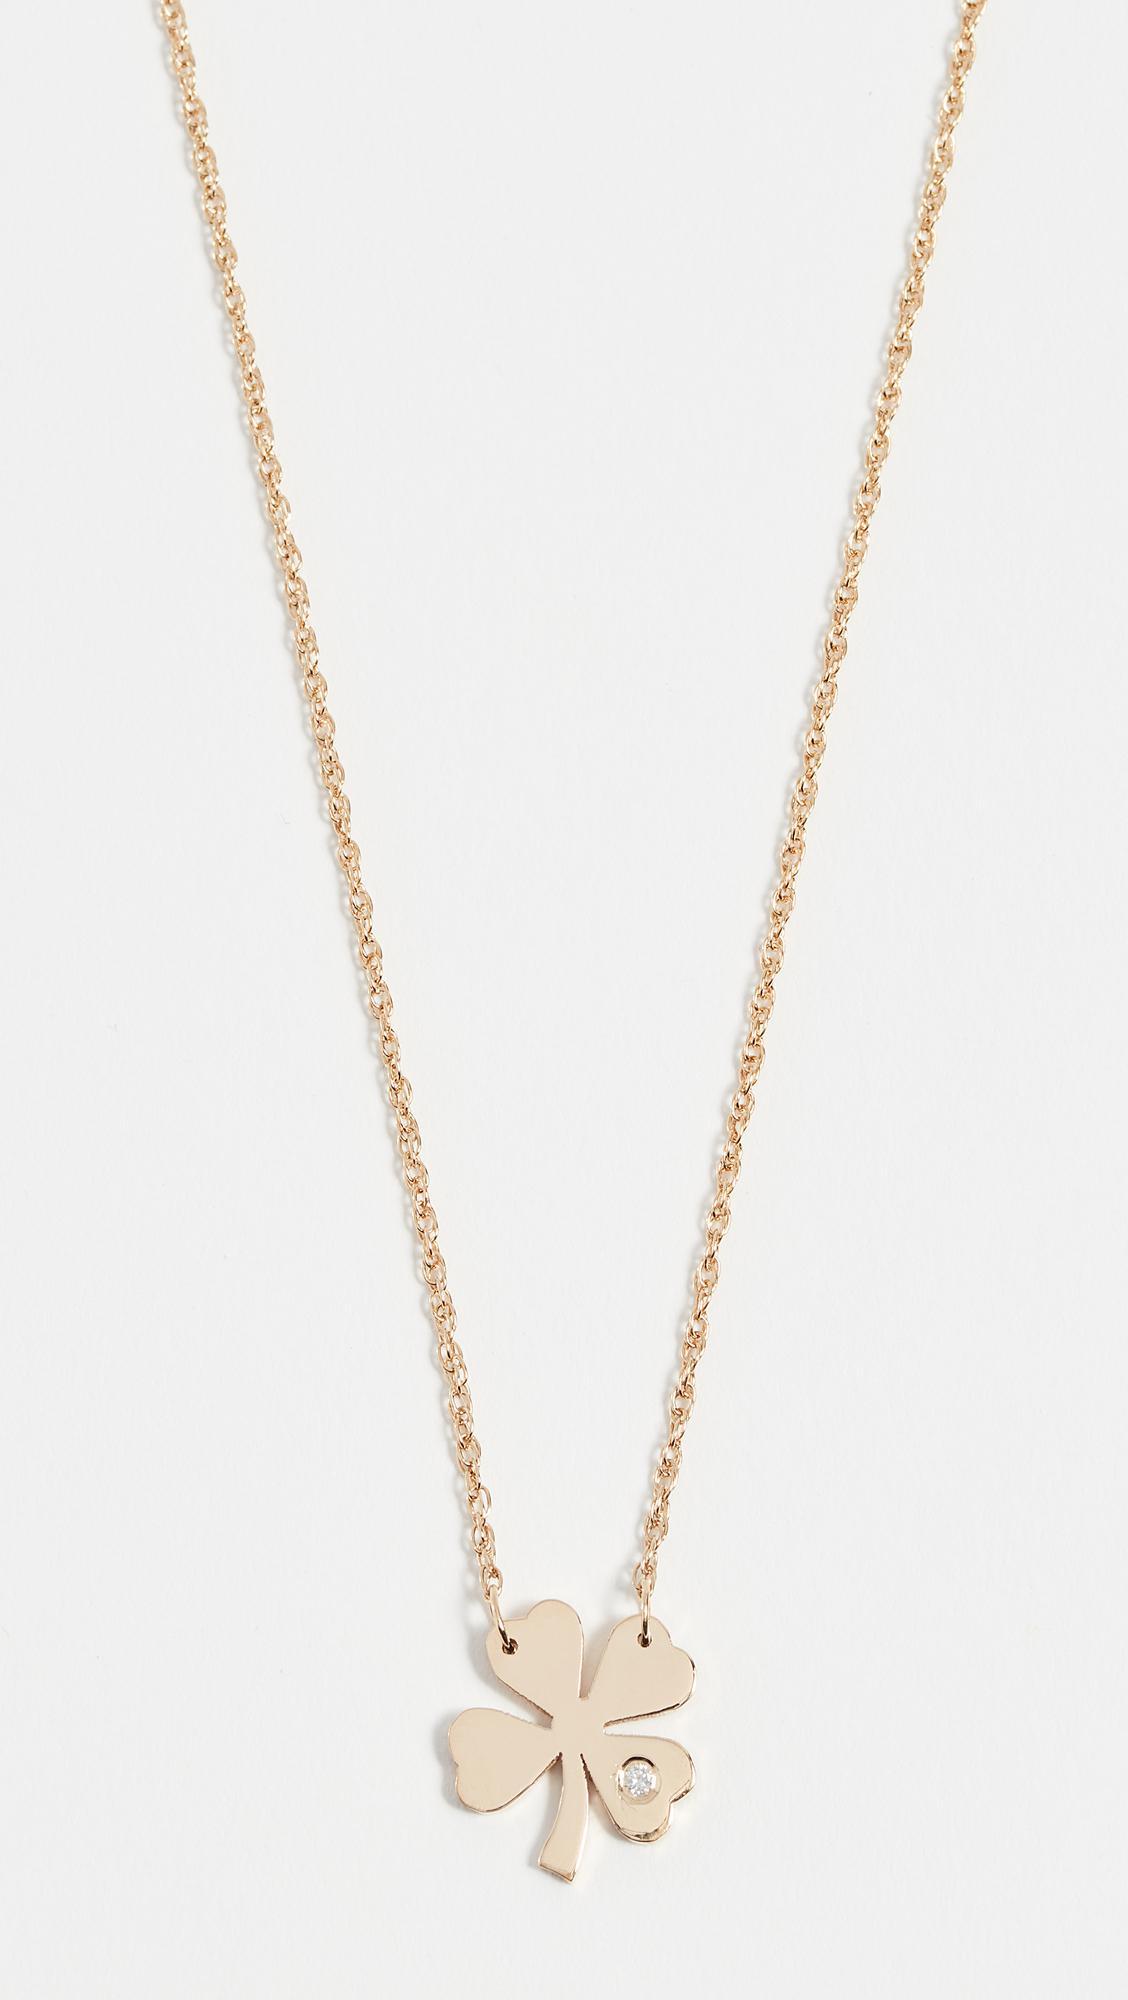 Jennifer Zeuner Clover Necklace with Diamond fvb5ND